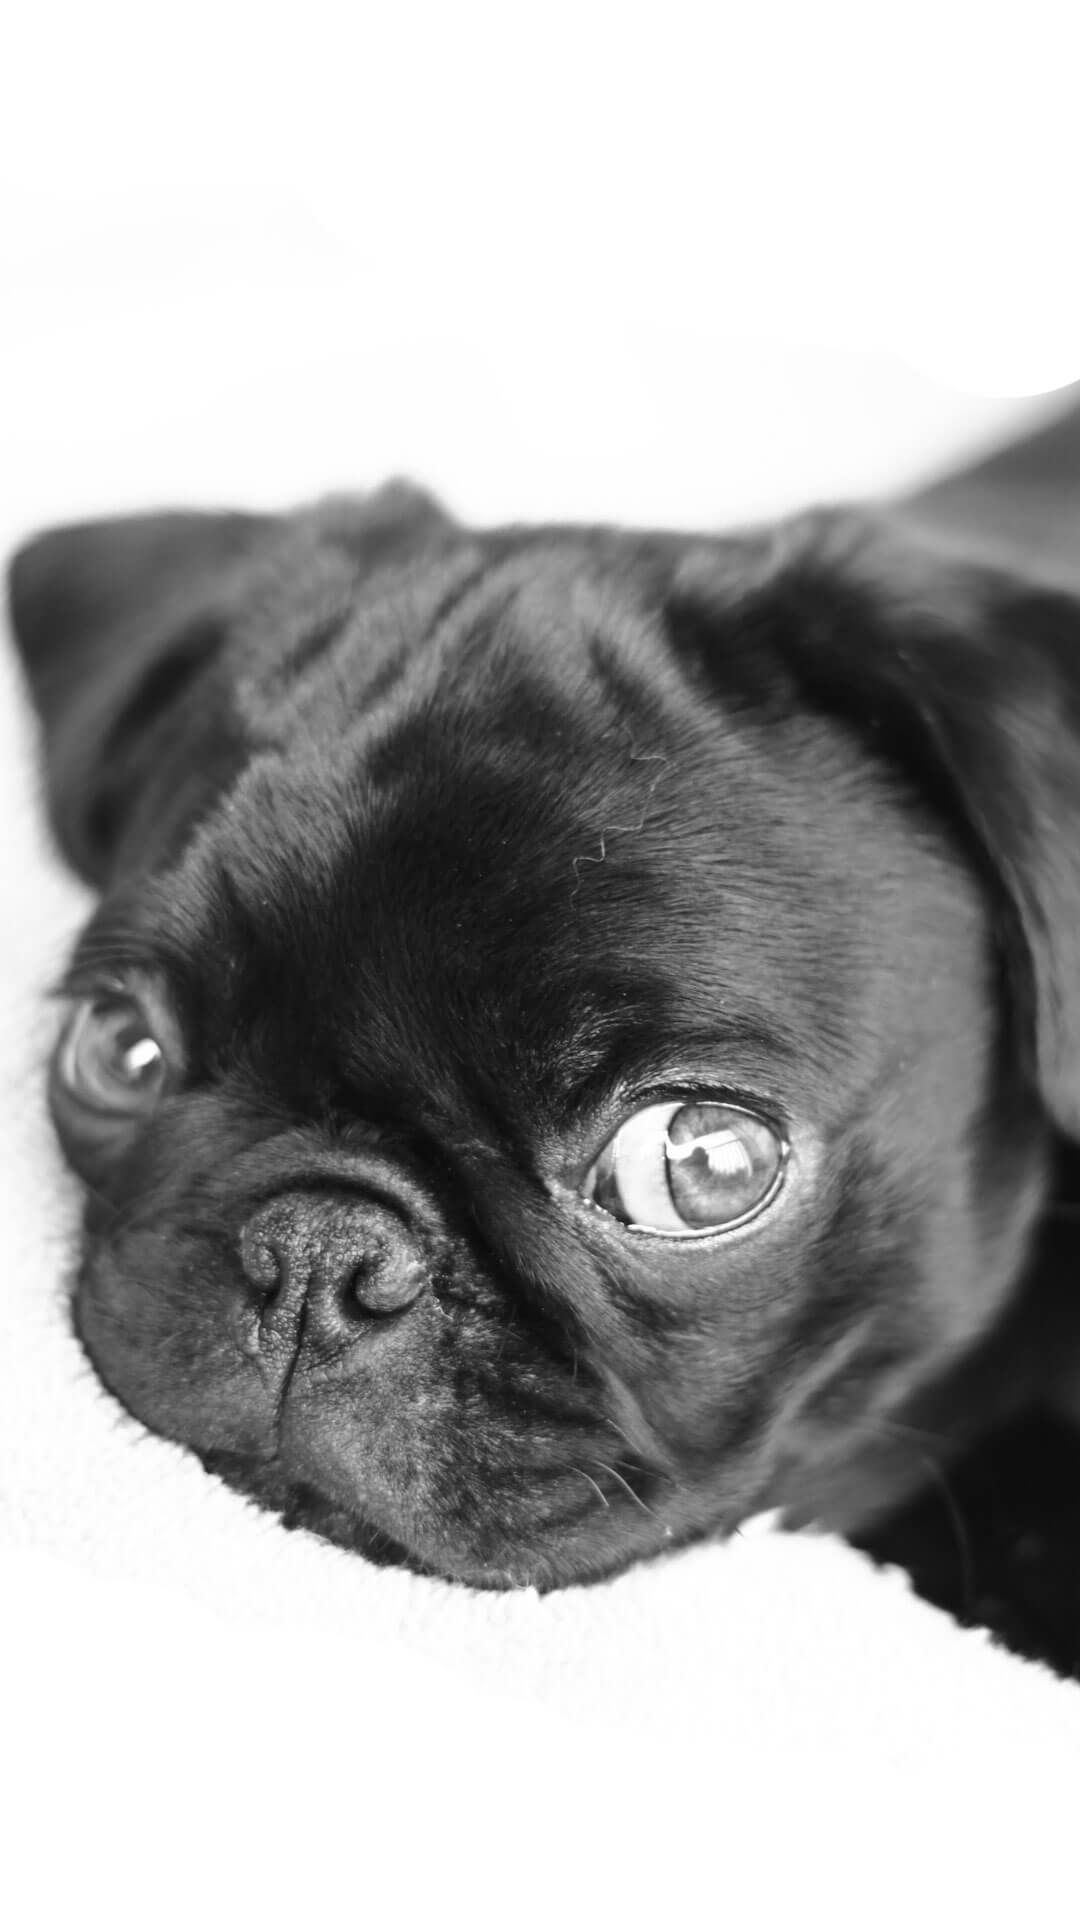 Cute Pugs Puppies Iphone 6 Wallpaper Hd Pug Wallpaper Cute Pug